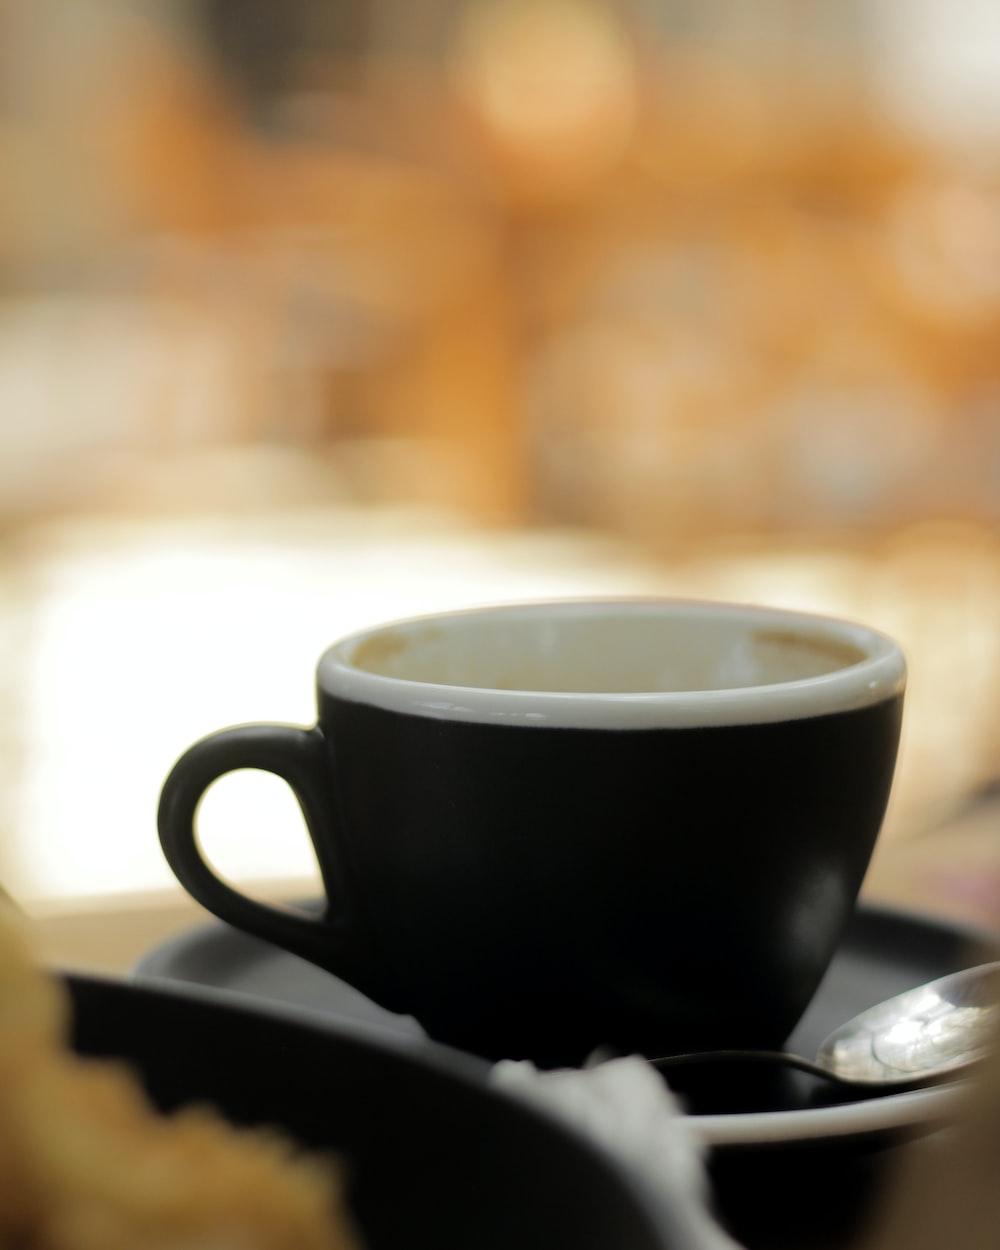 black ceramic mug on saucer